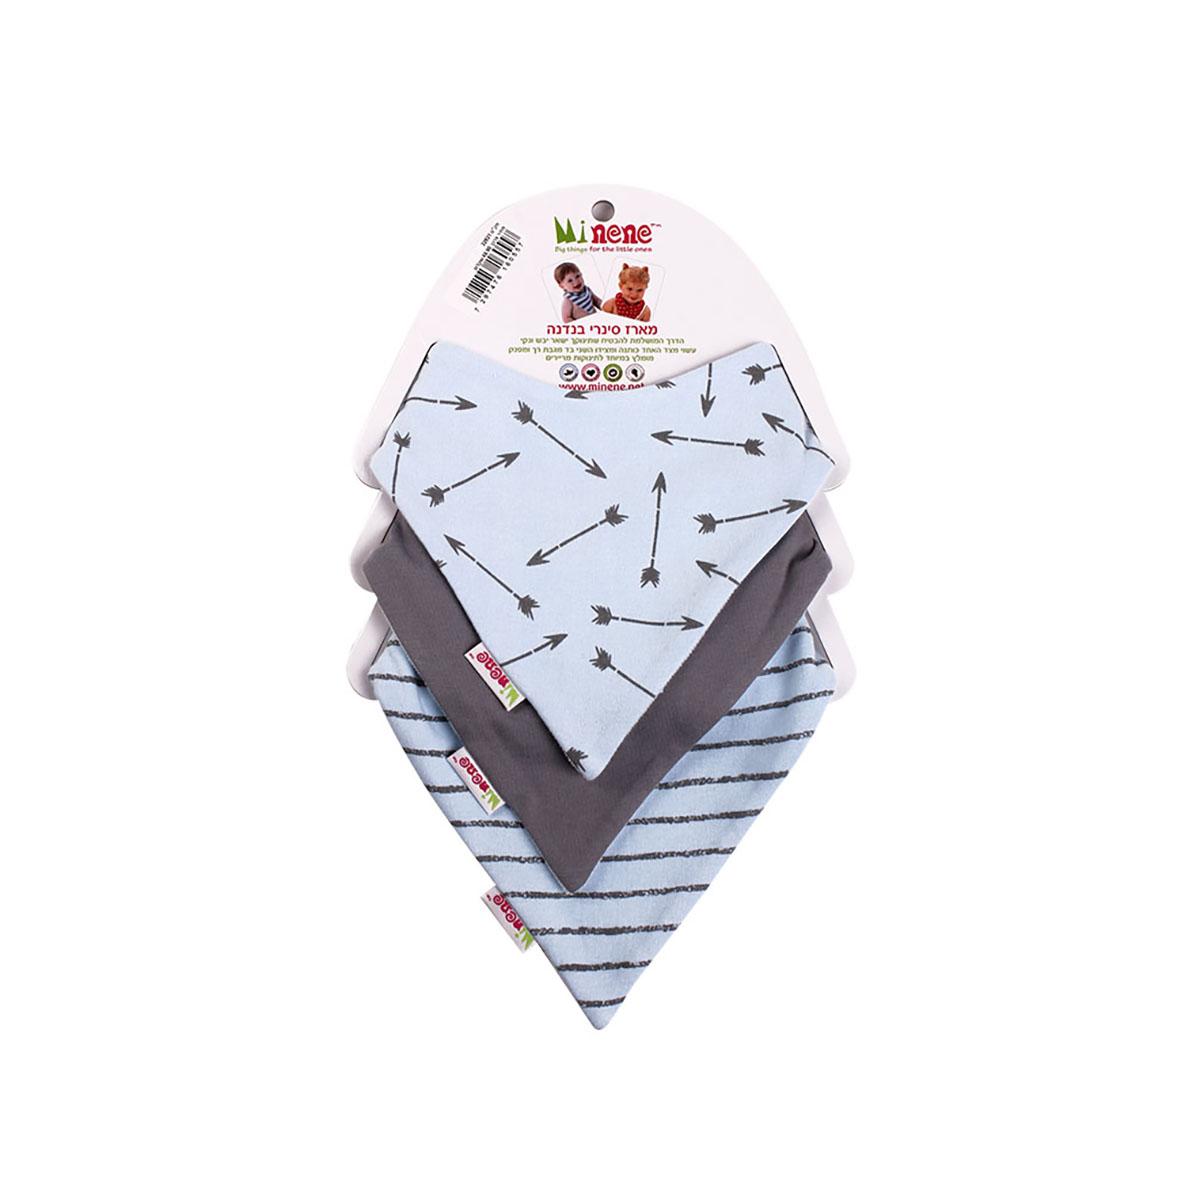 Set 3 bavetele triunghiulare pentru bebelusi Minene, Albastru/Gri imagine